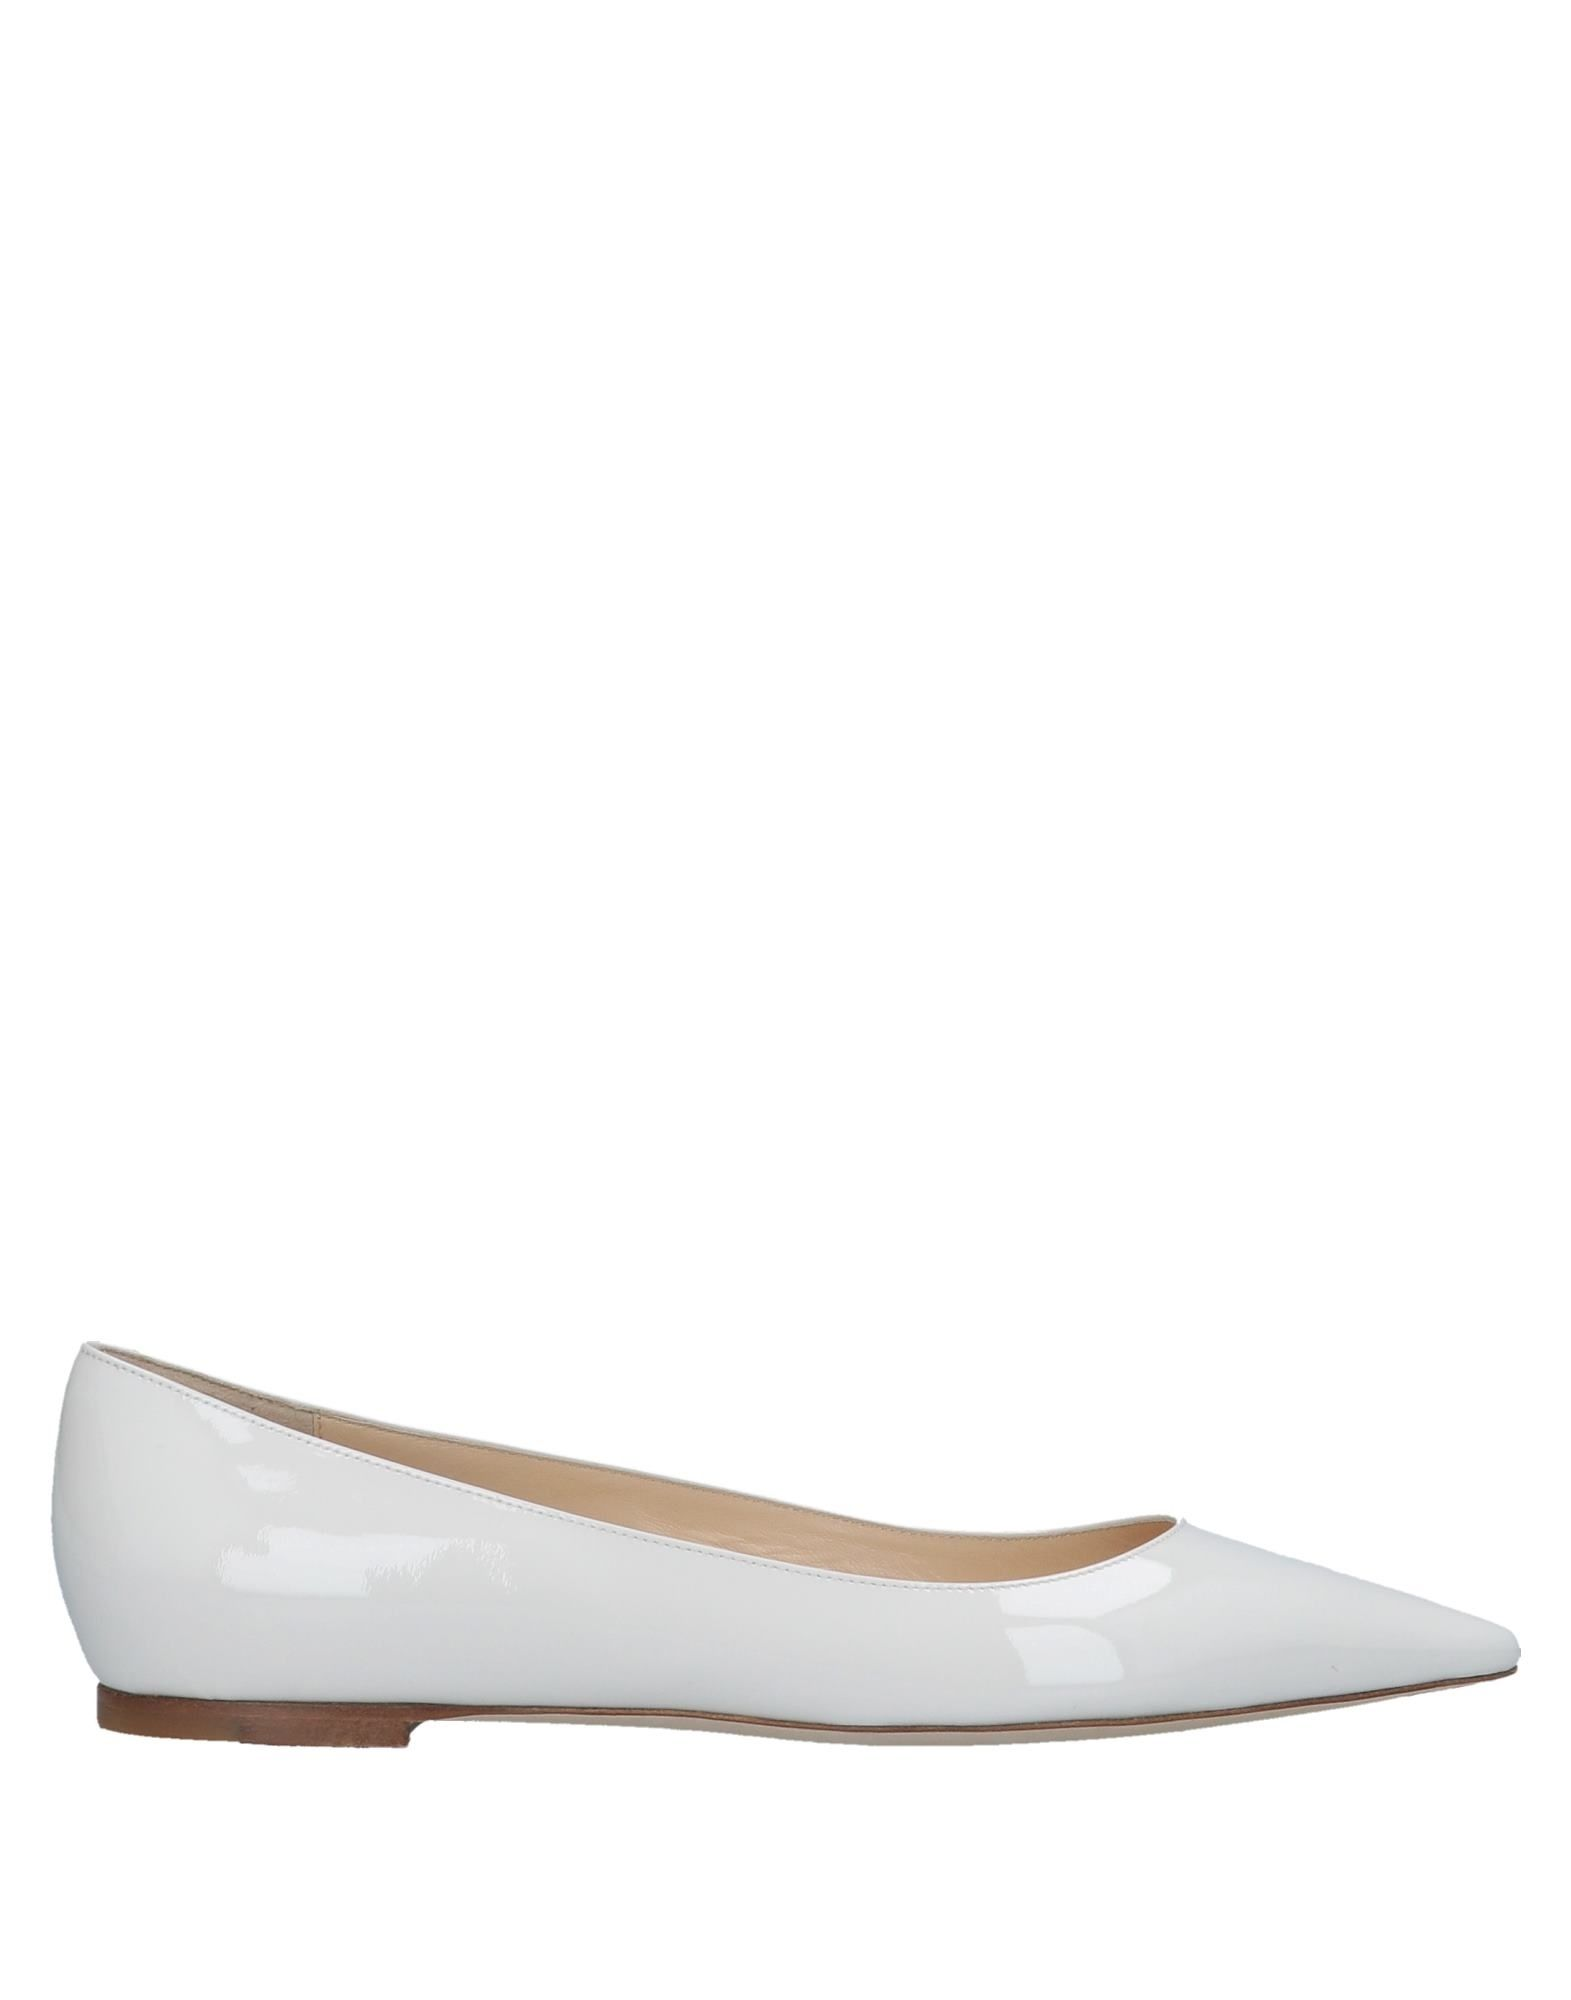 Rabatt Schuhe Jimmy Choo Ballerinas Damen  11449269XE